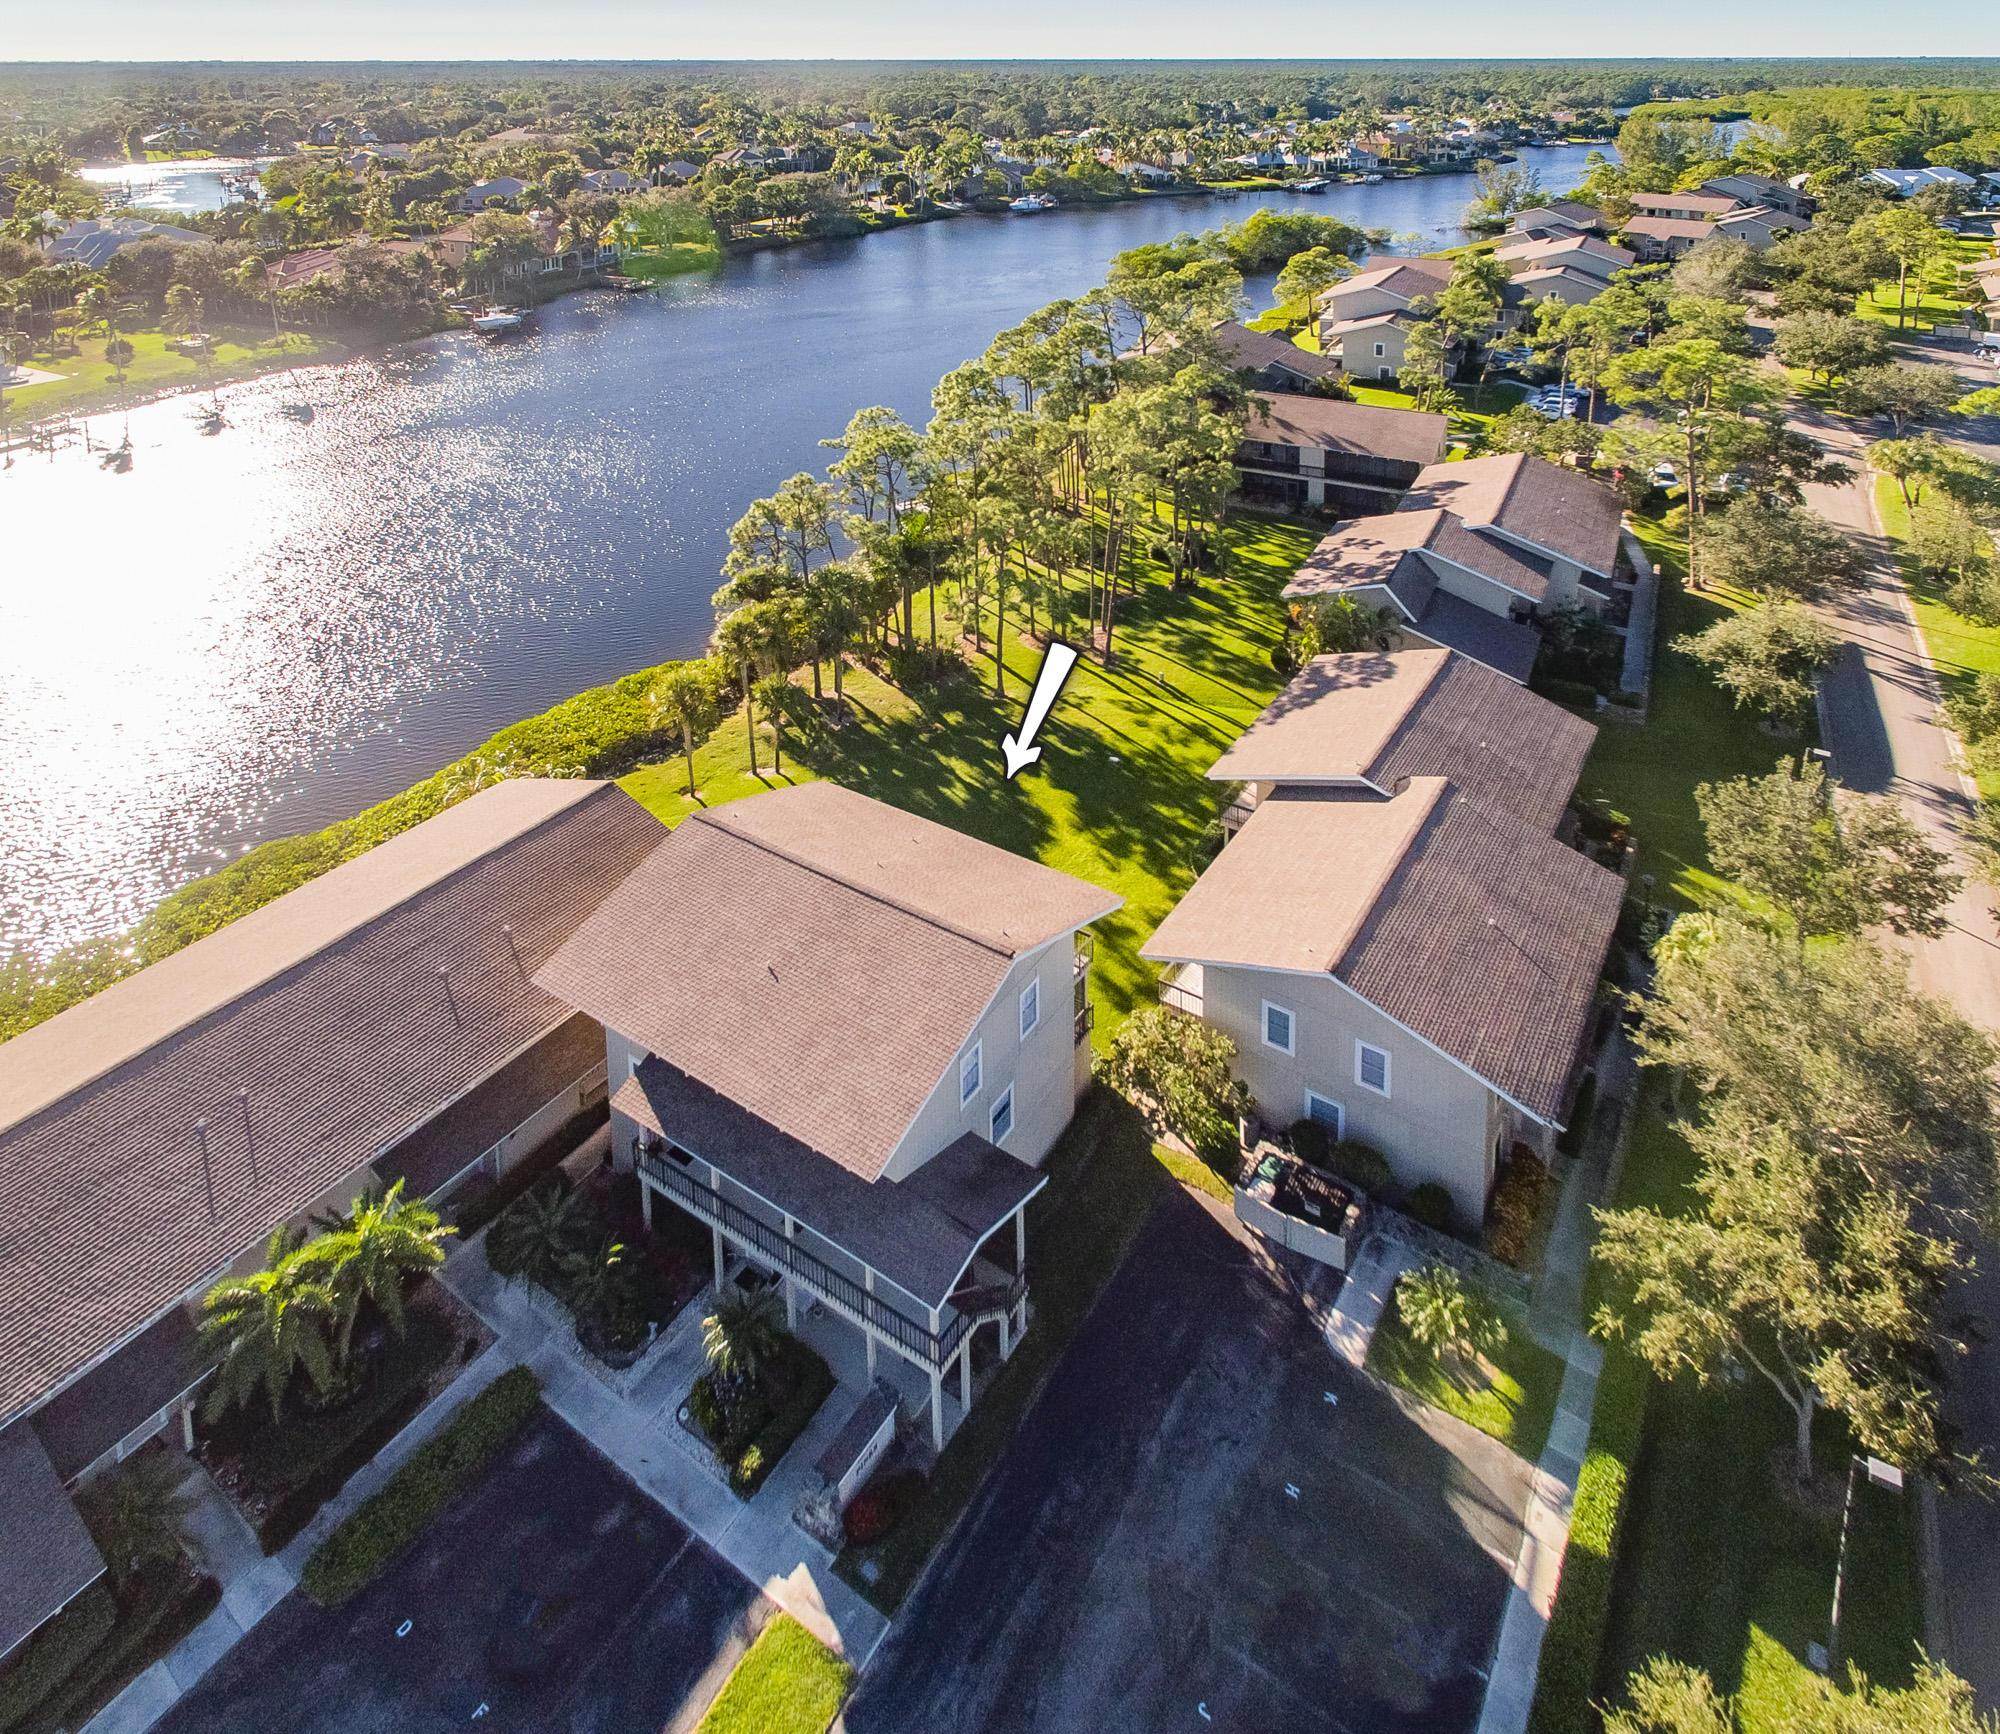 9230 Riverfront Terrace E, Tequesta, Florida 33469, 2 Bedrooms Bedrooms, ,2 BathroomsBathrooms,A,Condominium,Riverfront,RX-10487144